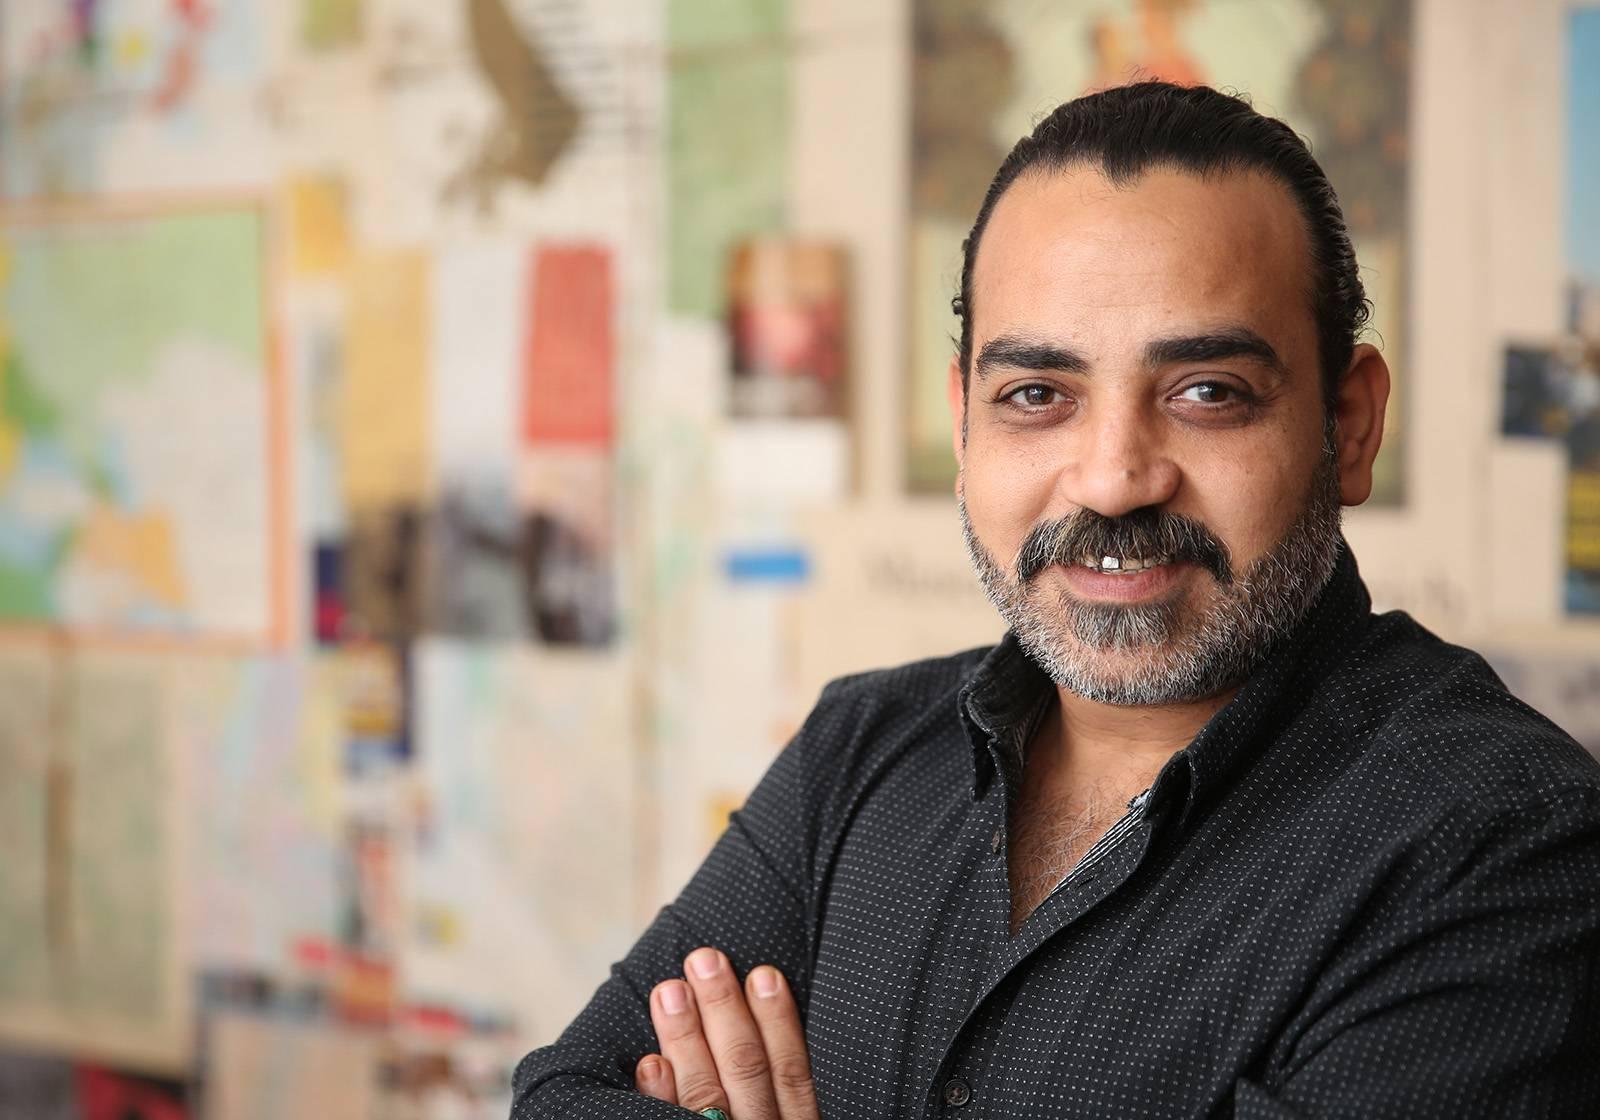 Hamdy Reda at Studio Artellawa, Cairo, 2017 (Image: Mostafa Abdel Aty)